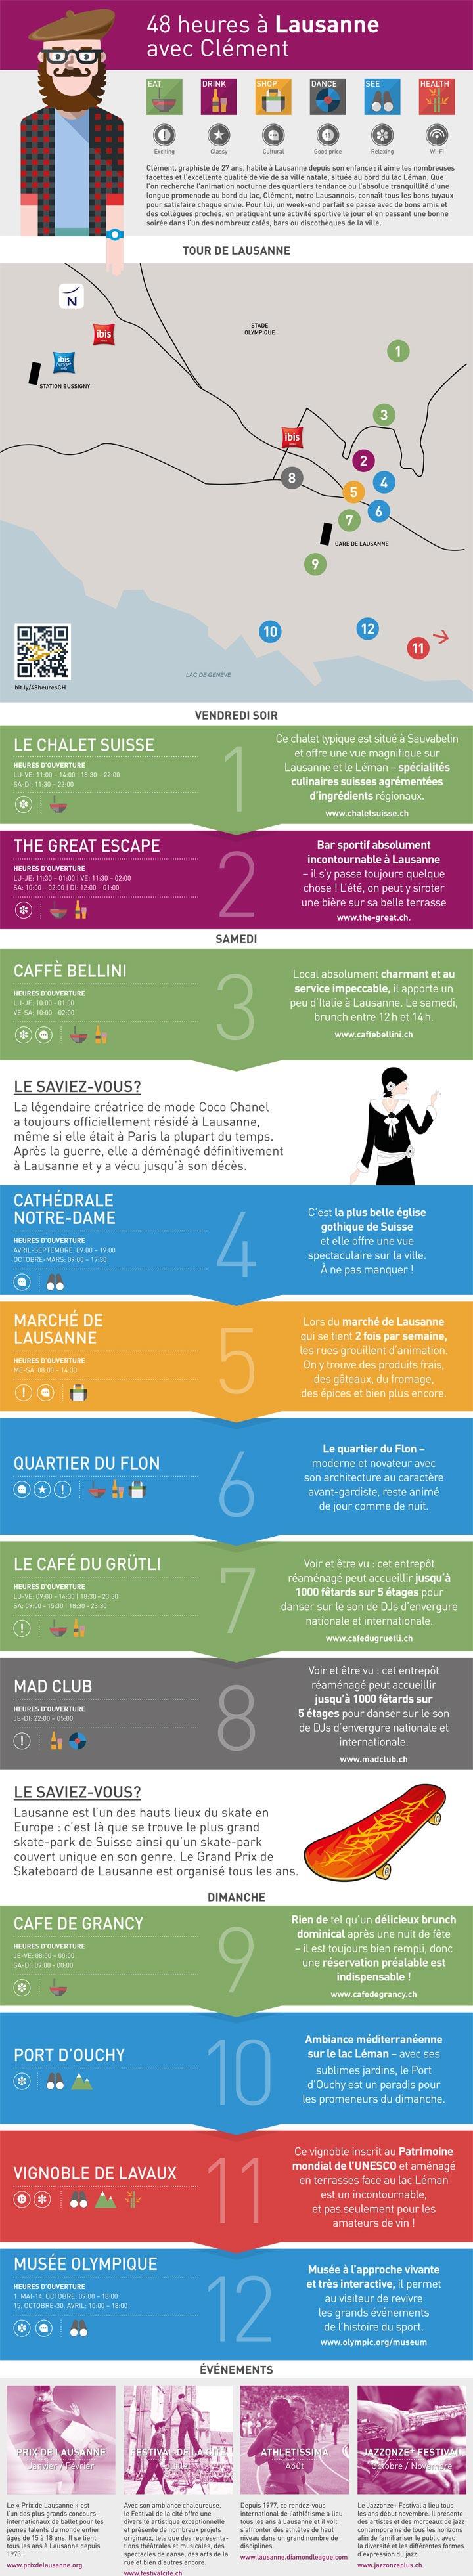 infographie lausanne